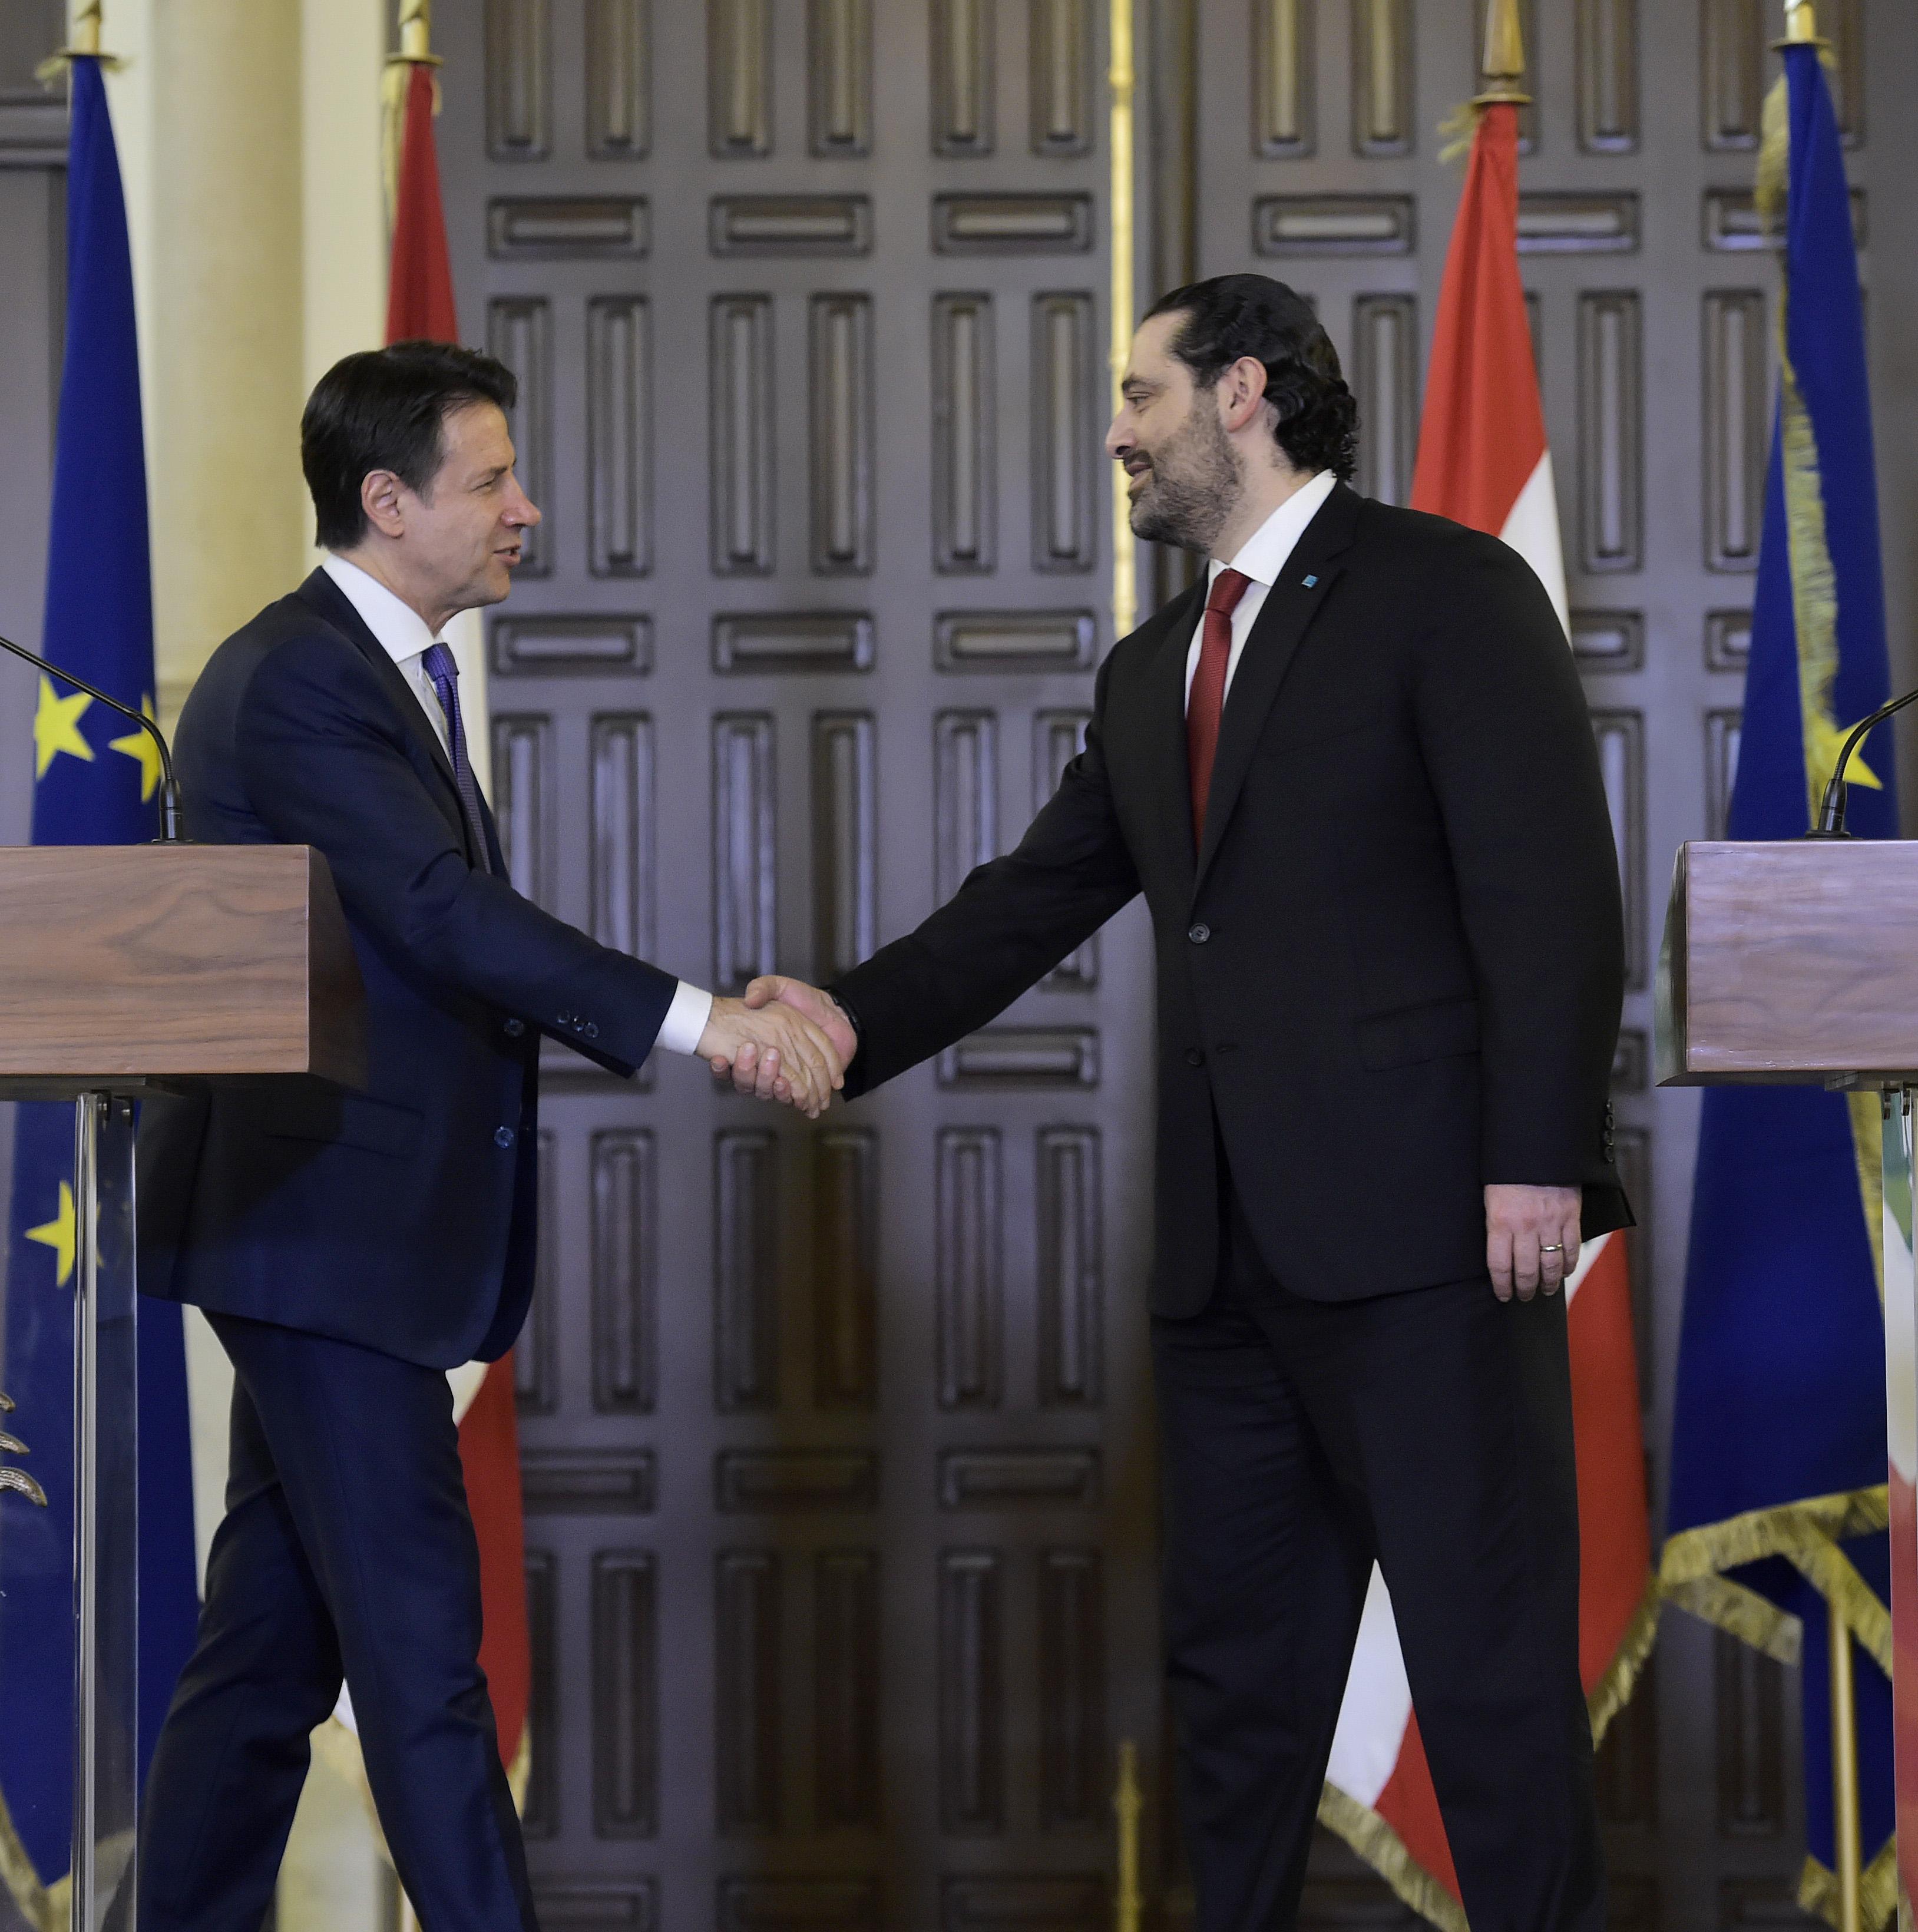 Pr Minister Saad Hariri Receiving Italian Pr Minister 1